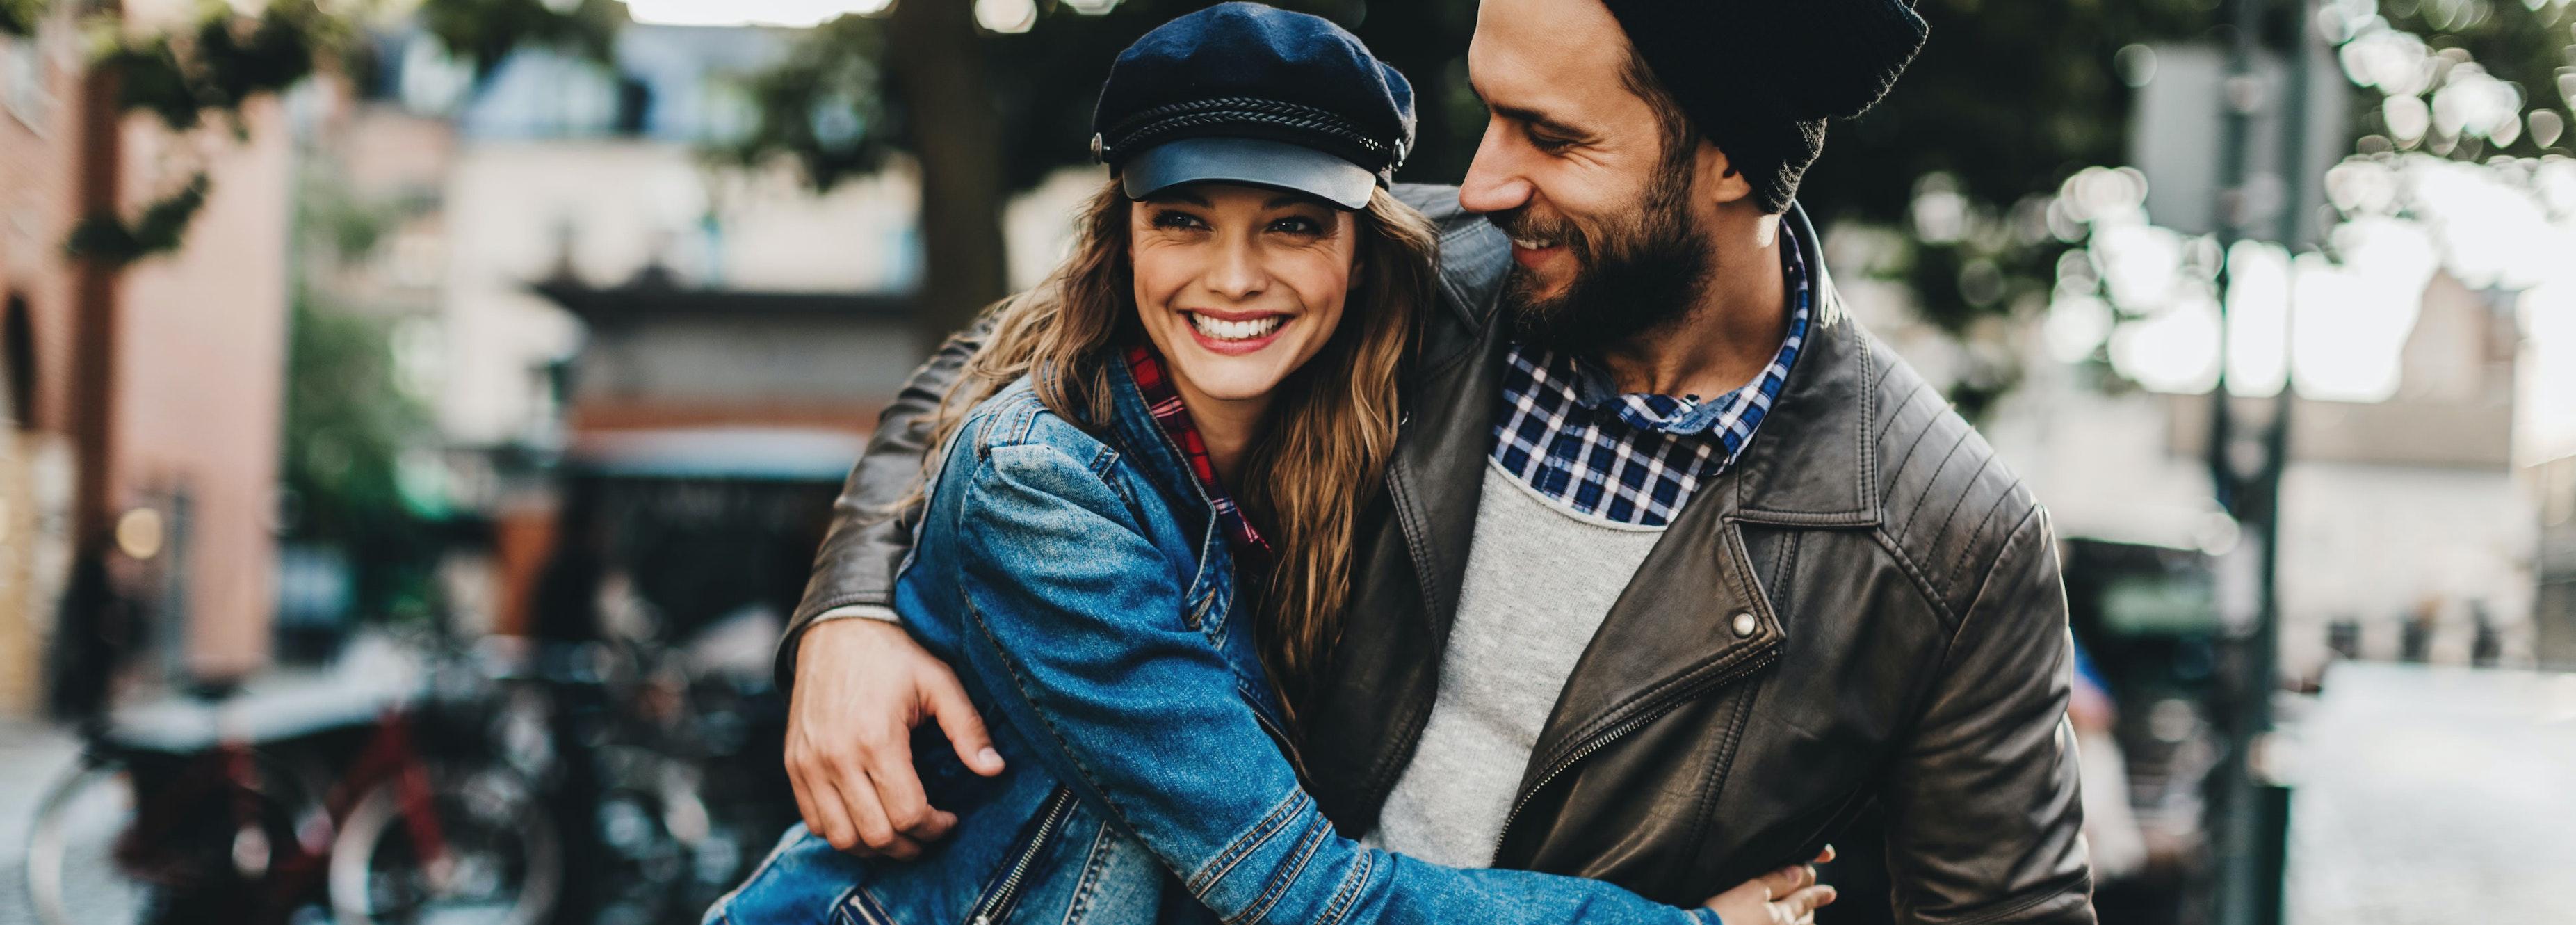 Kungsholmen dating p ntet gratis fitta gratis thai udon